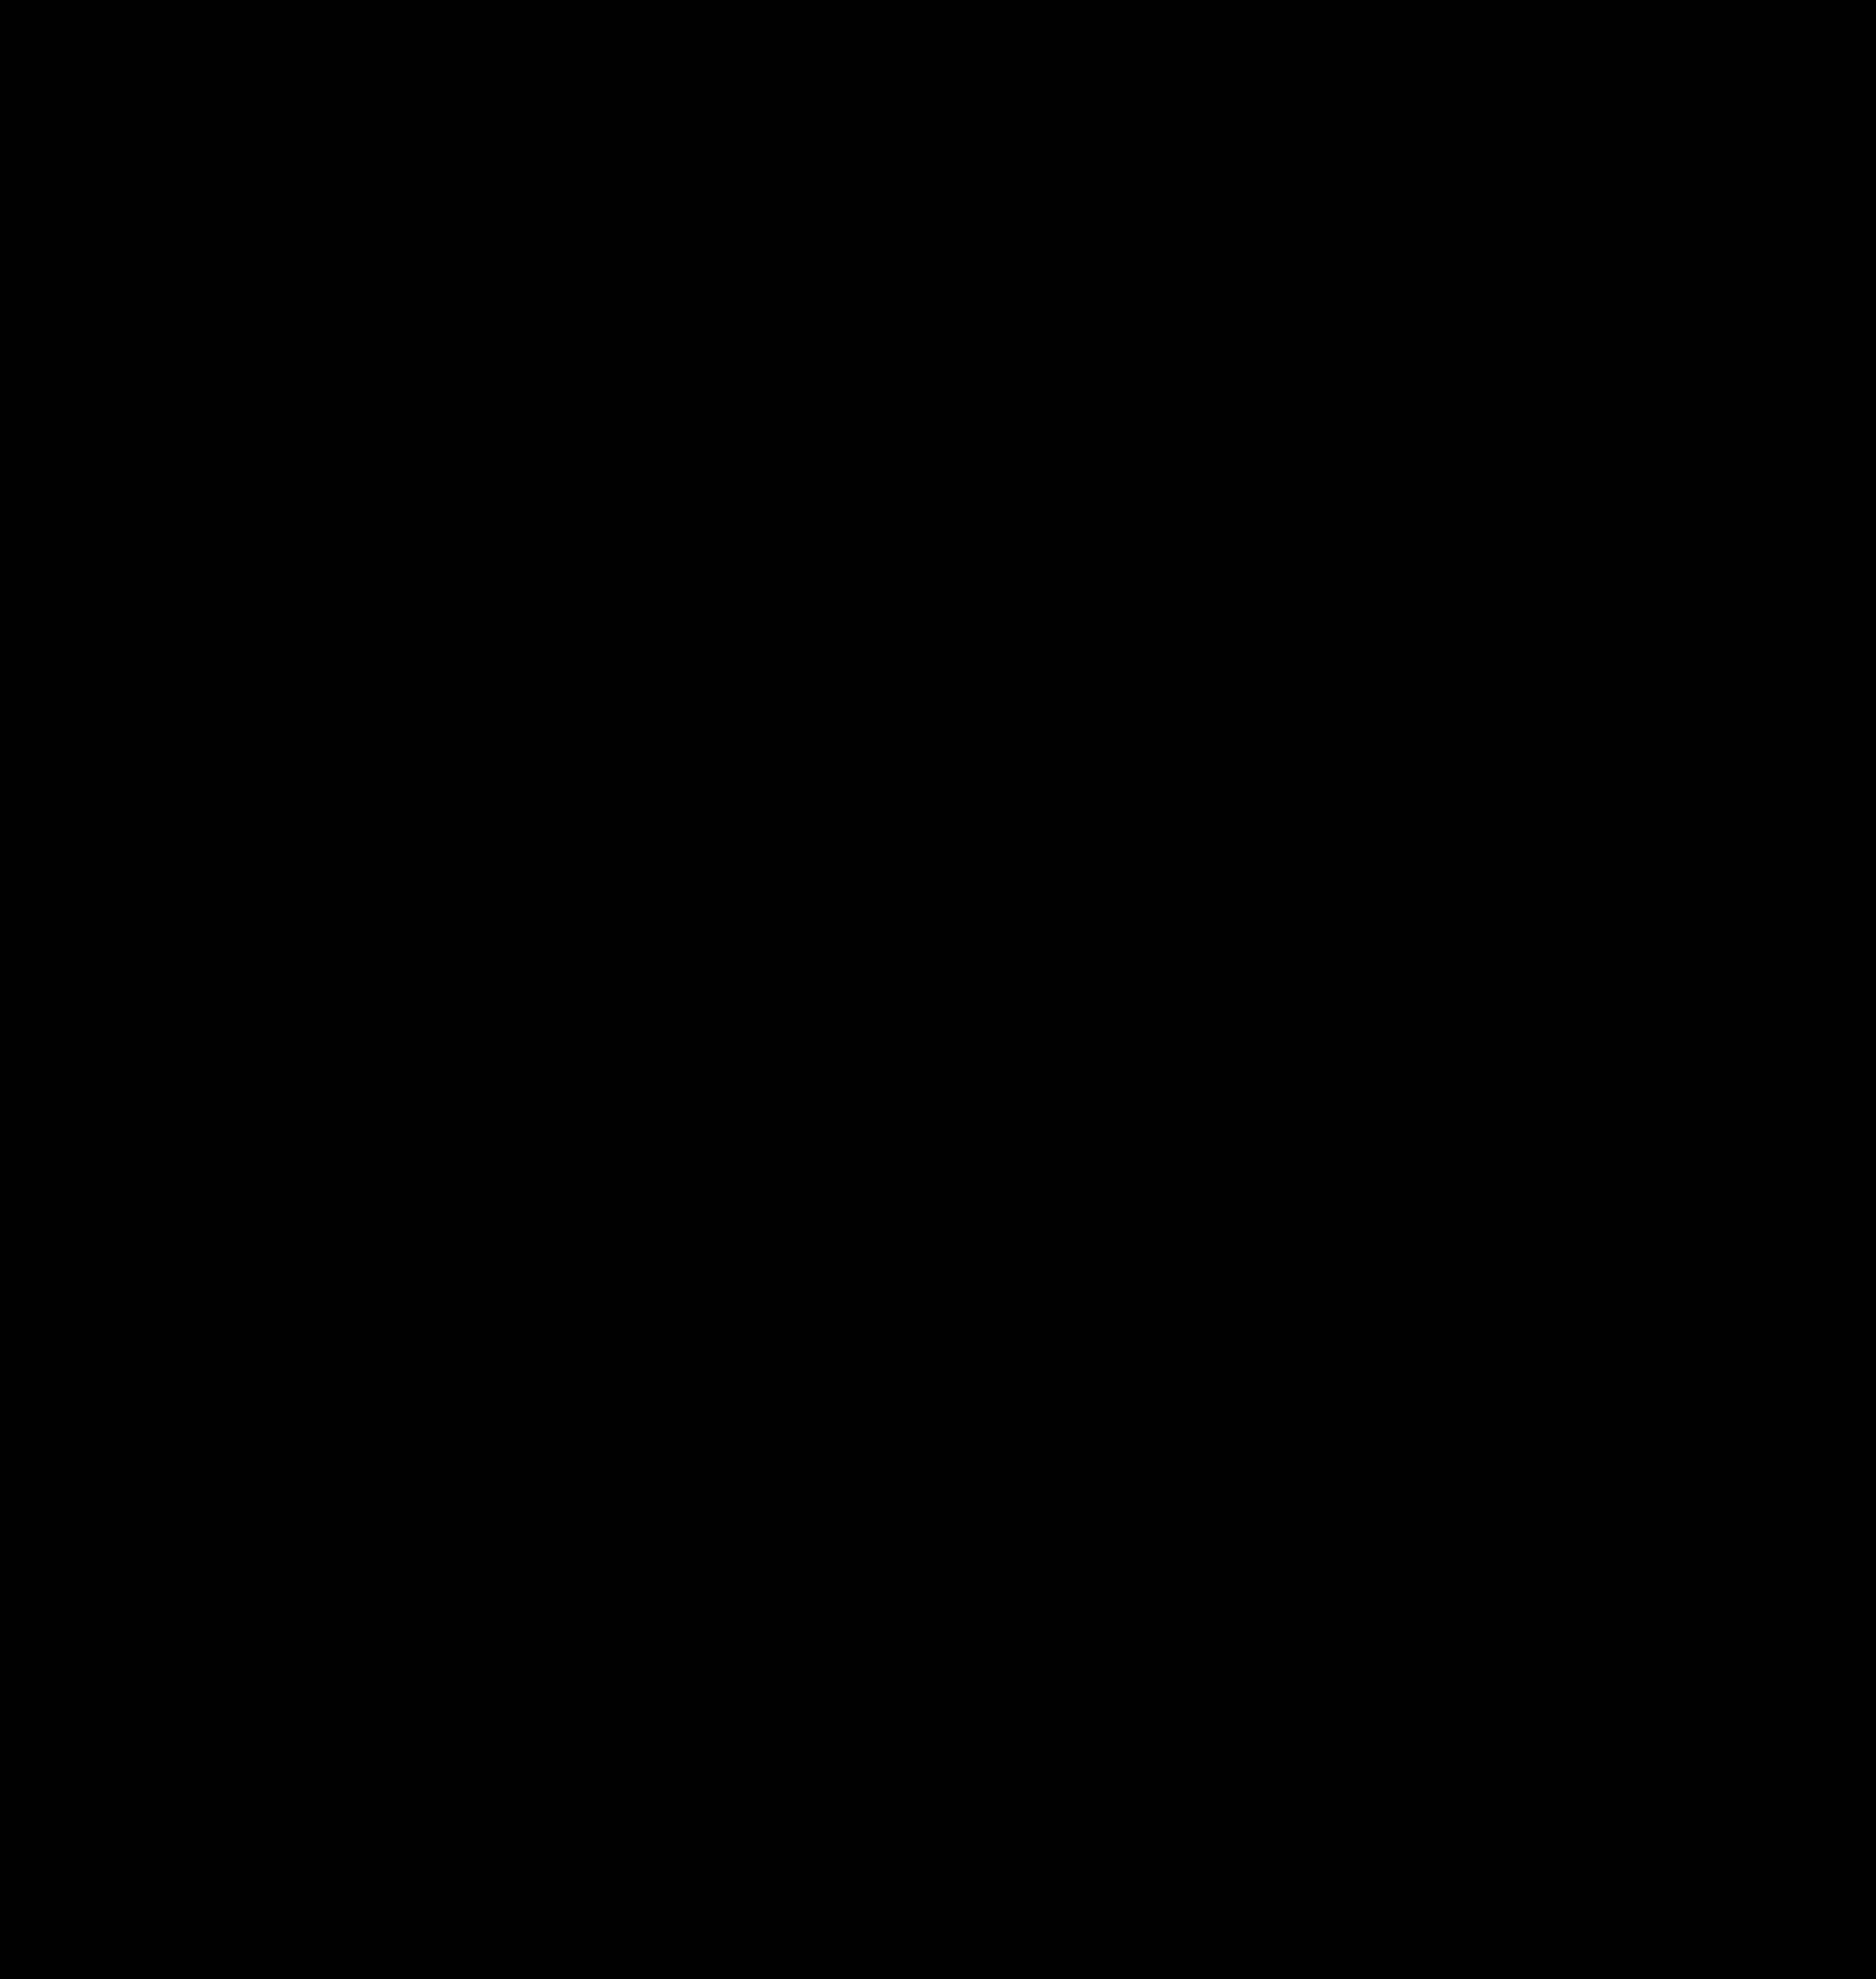 2188x2308 Clipart